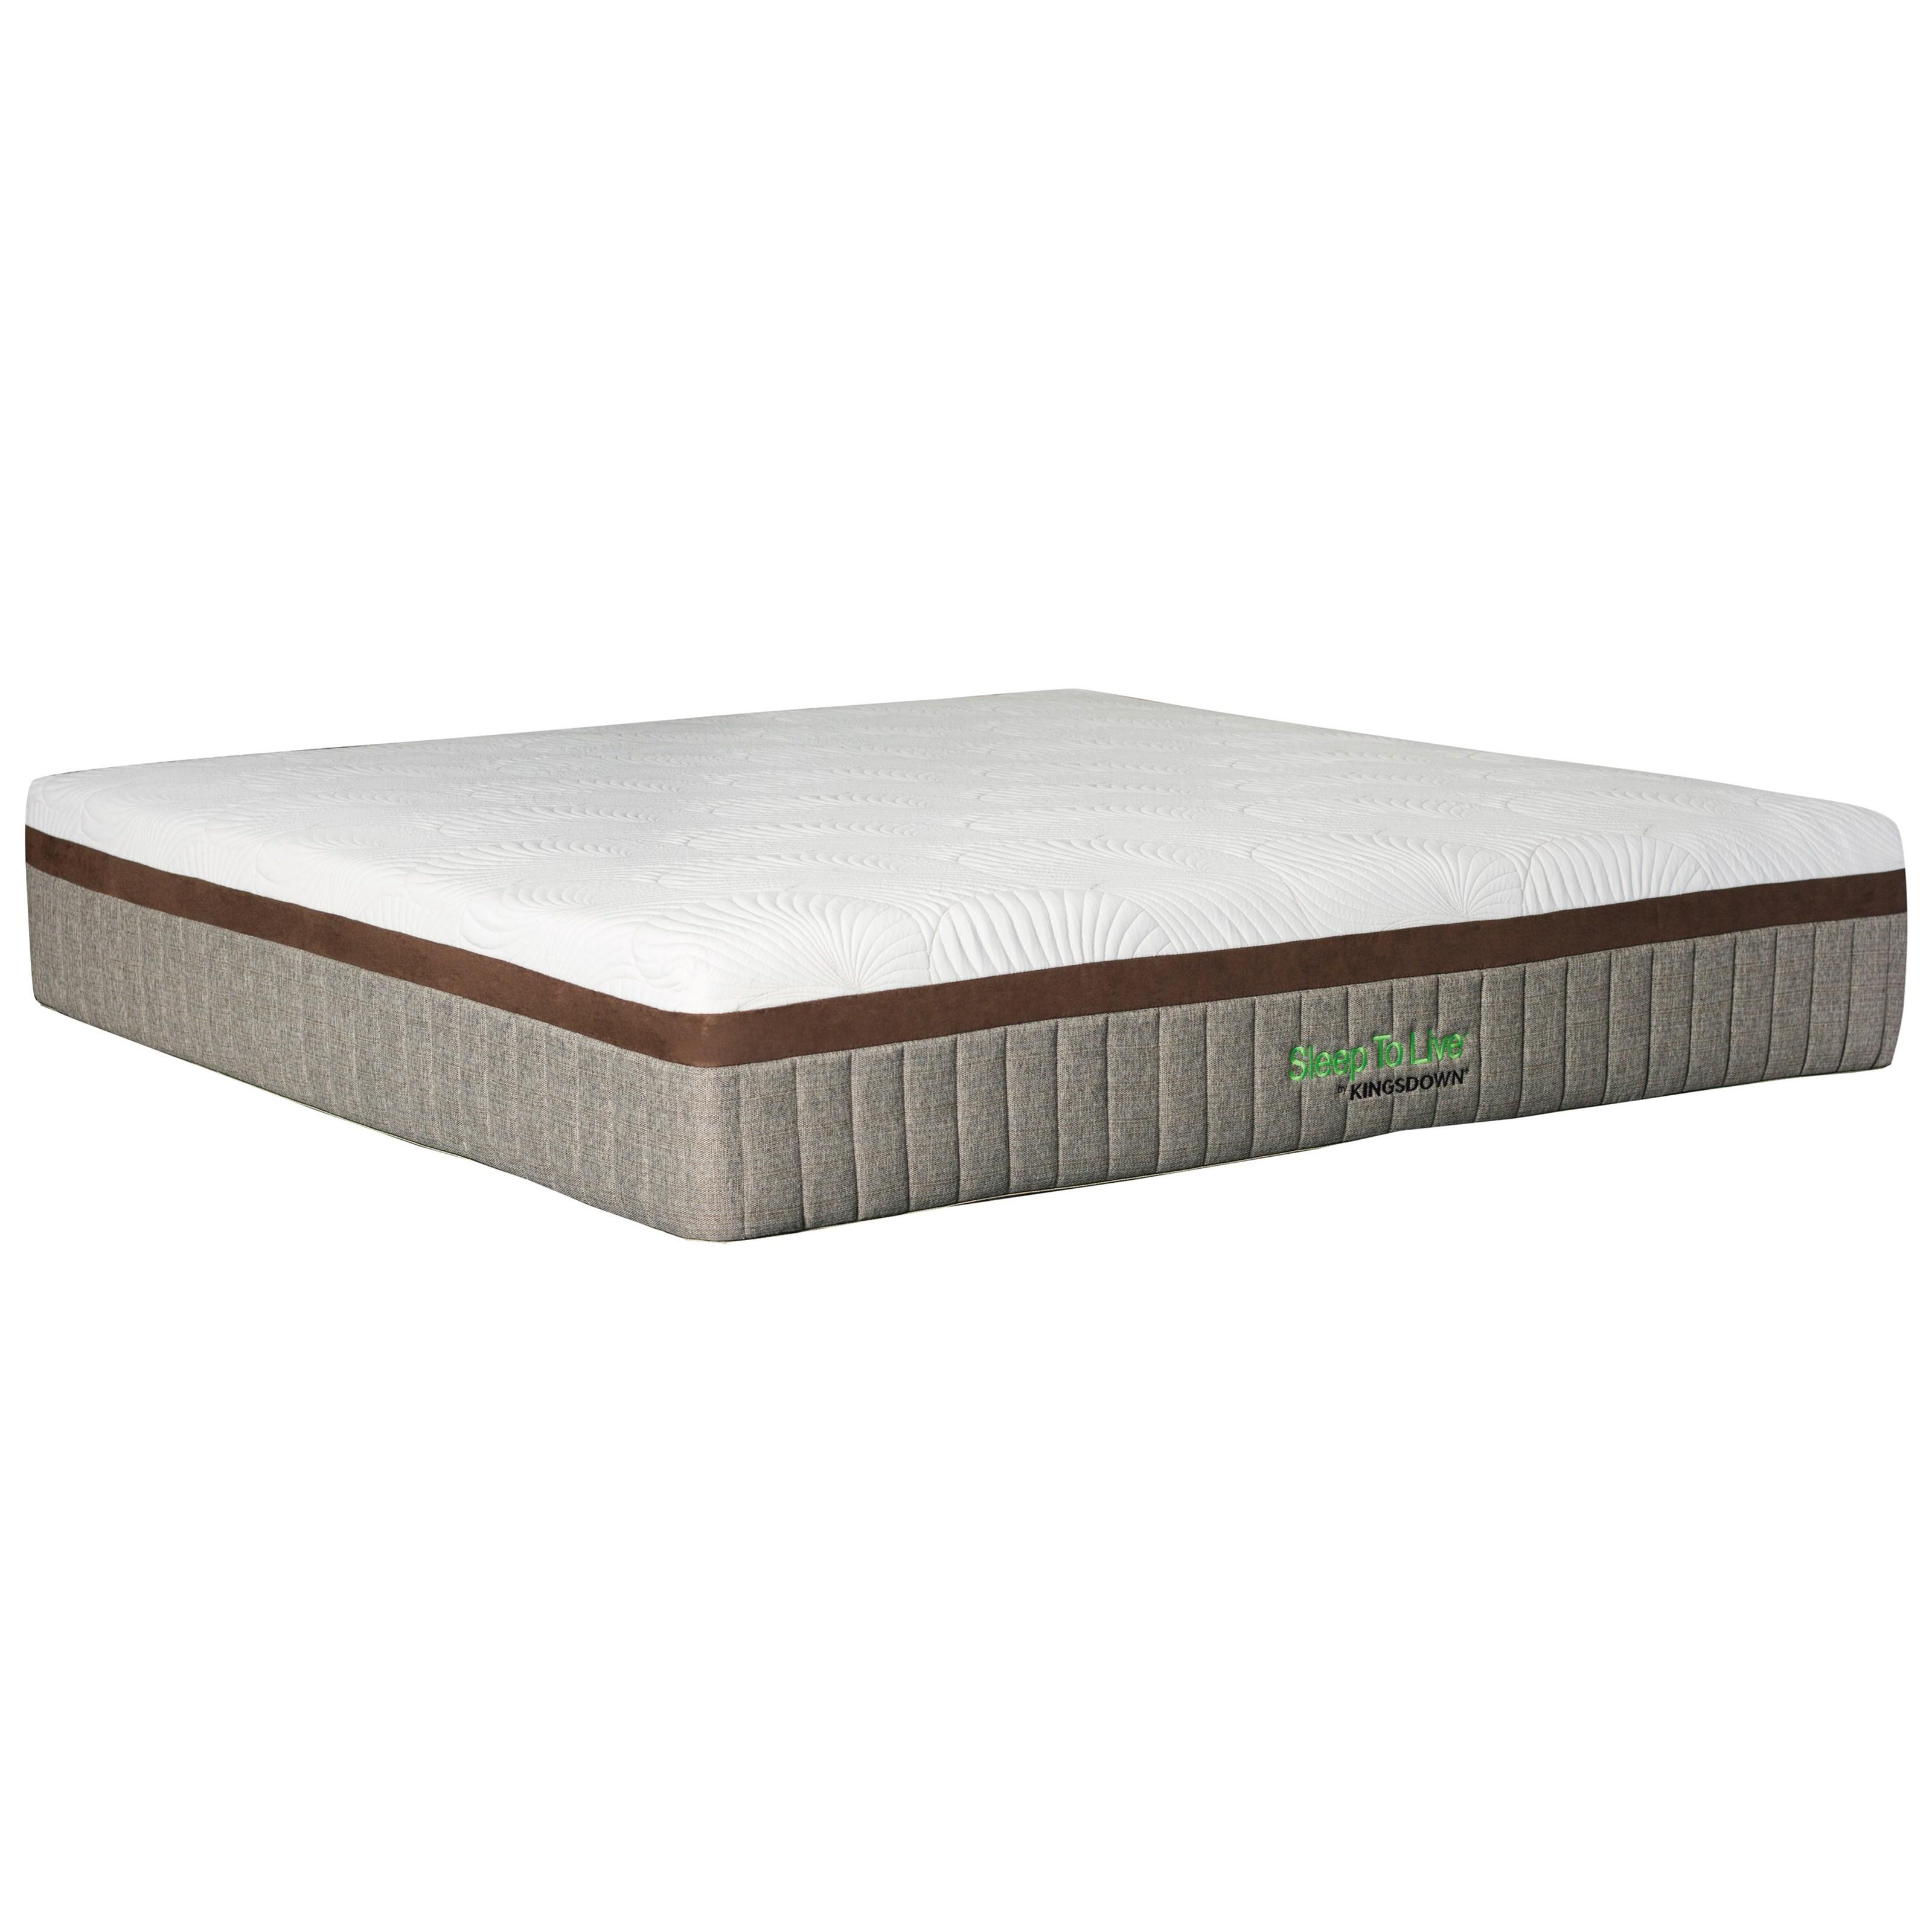 kingsdown 700 series 5819 red red5819 q 1512lpplus q queen 15 extra firm memory foam mattress. Black Bedroom Furniture Sets. Home Design Ideas